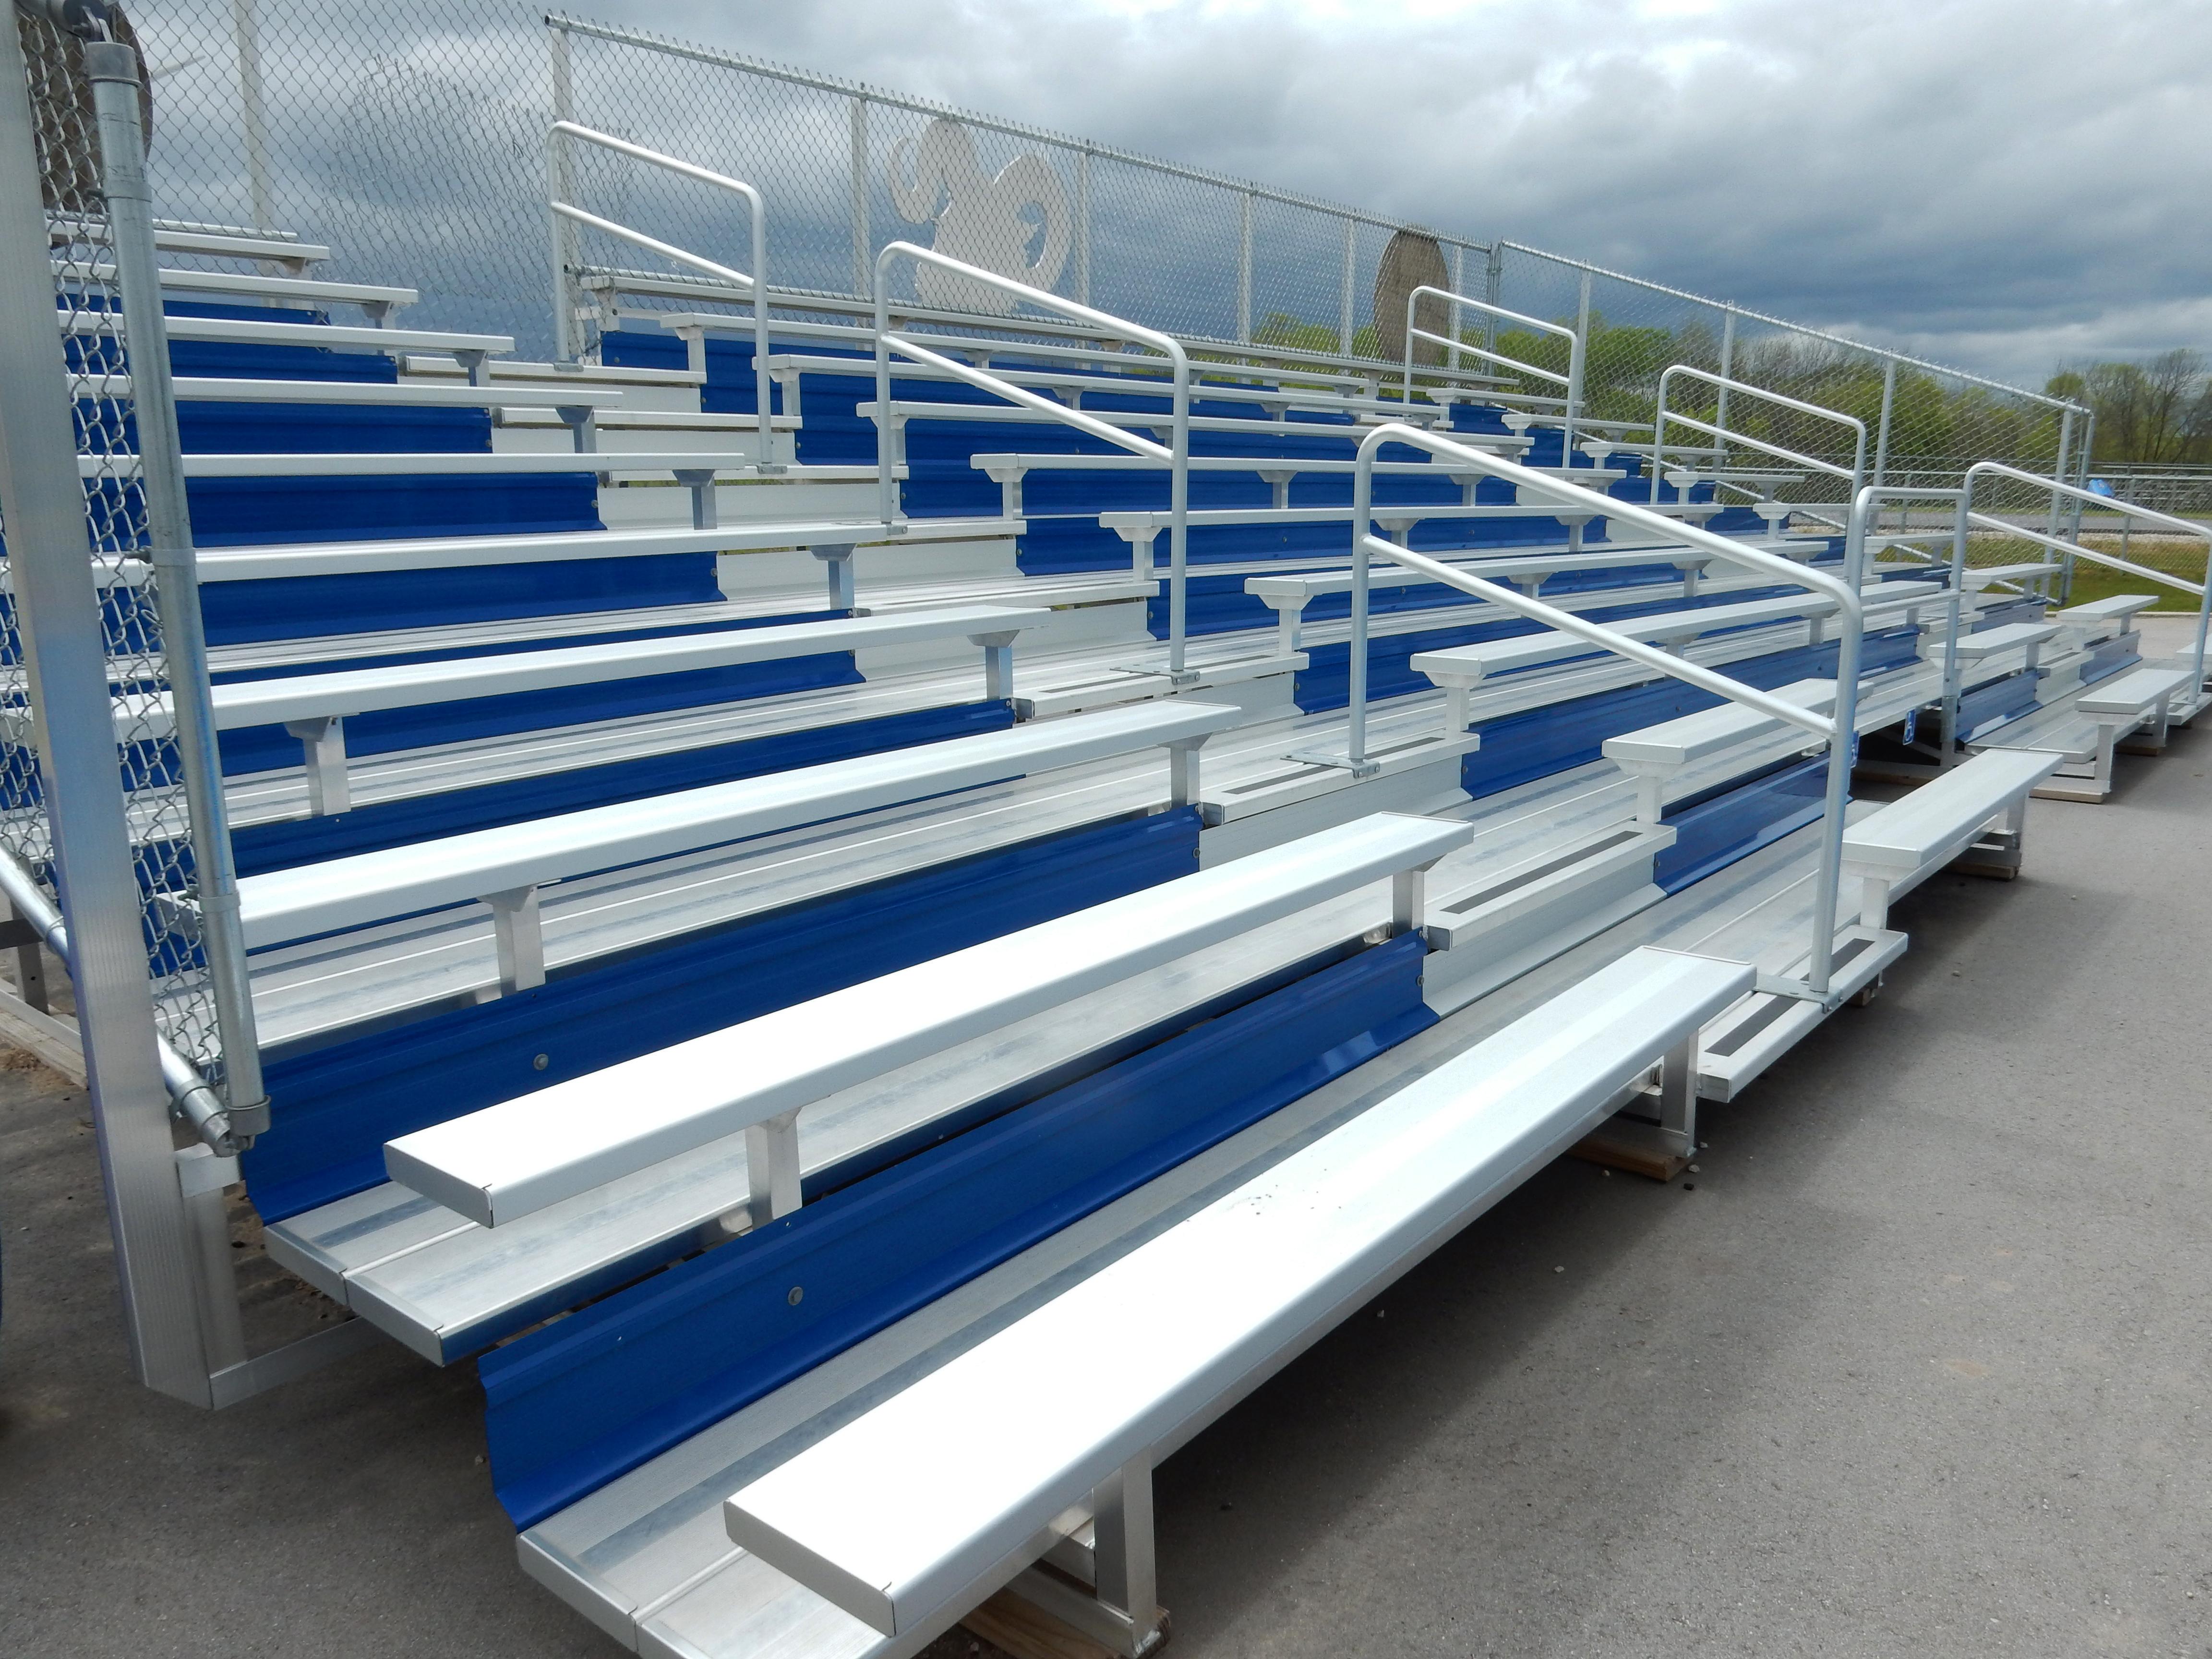 10 row custom bleachers with blue risers.